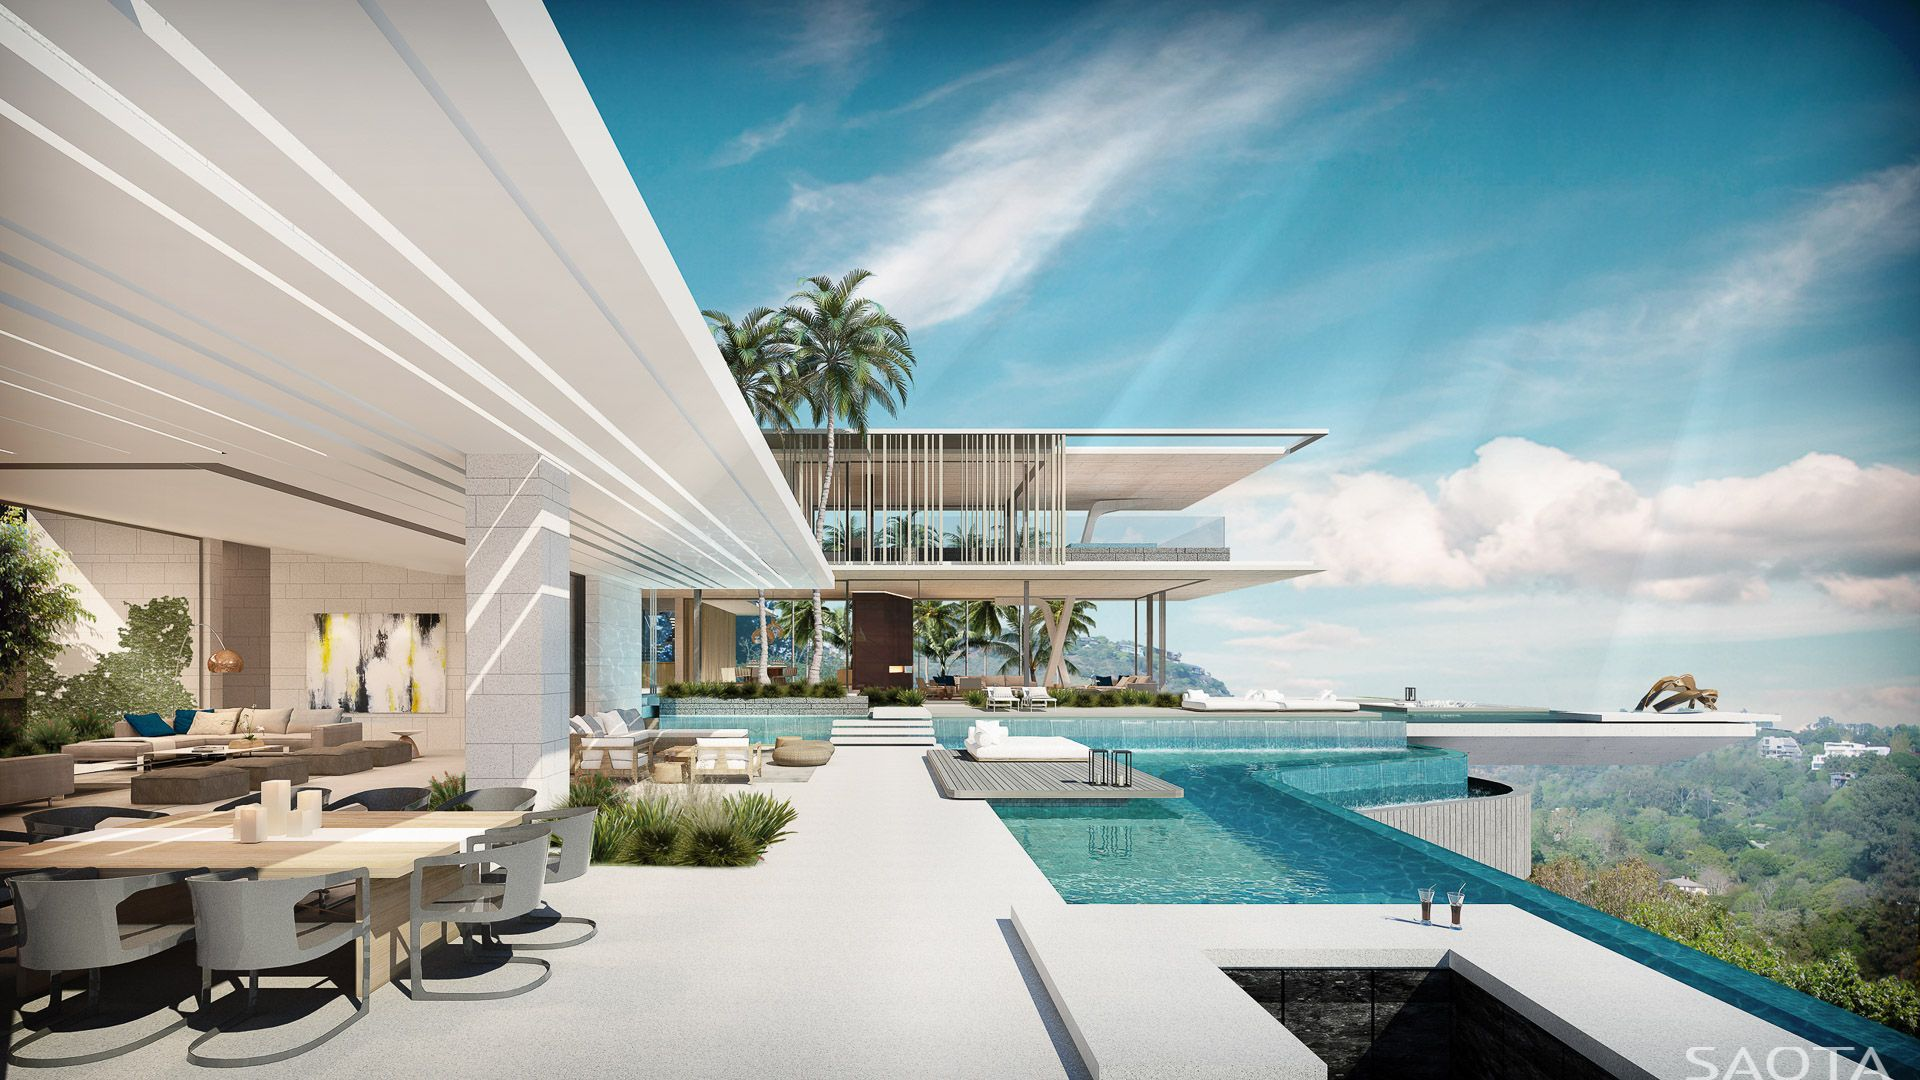 SAOTA x Studio Parkington Cliffside Residence recommendations